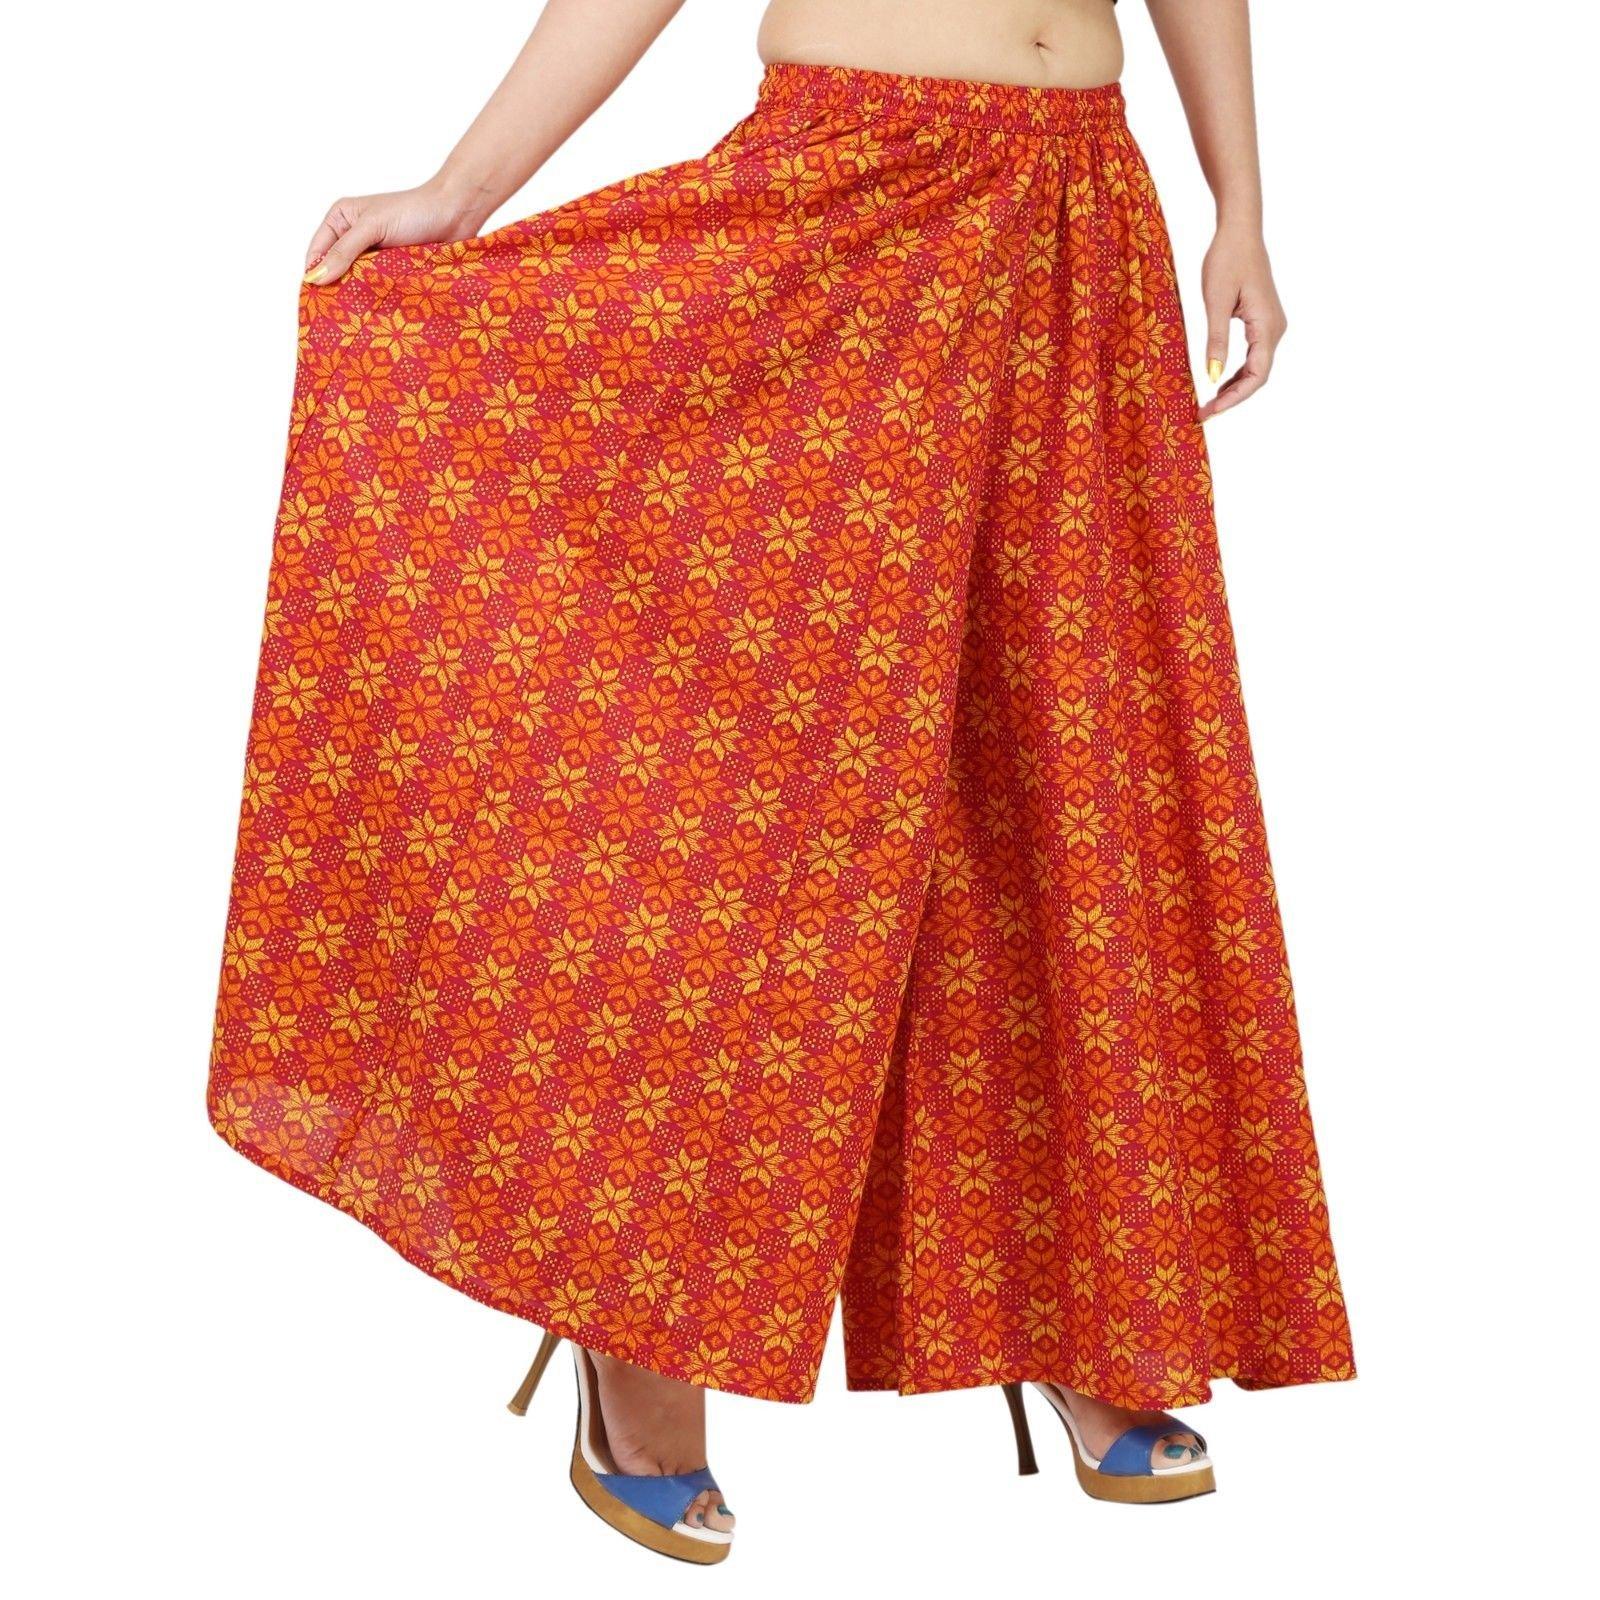 Orange Cotton Extra Wide Leg Pant, Divider Palazzo, Harem, Comfy Skirt